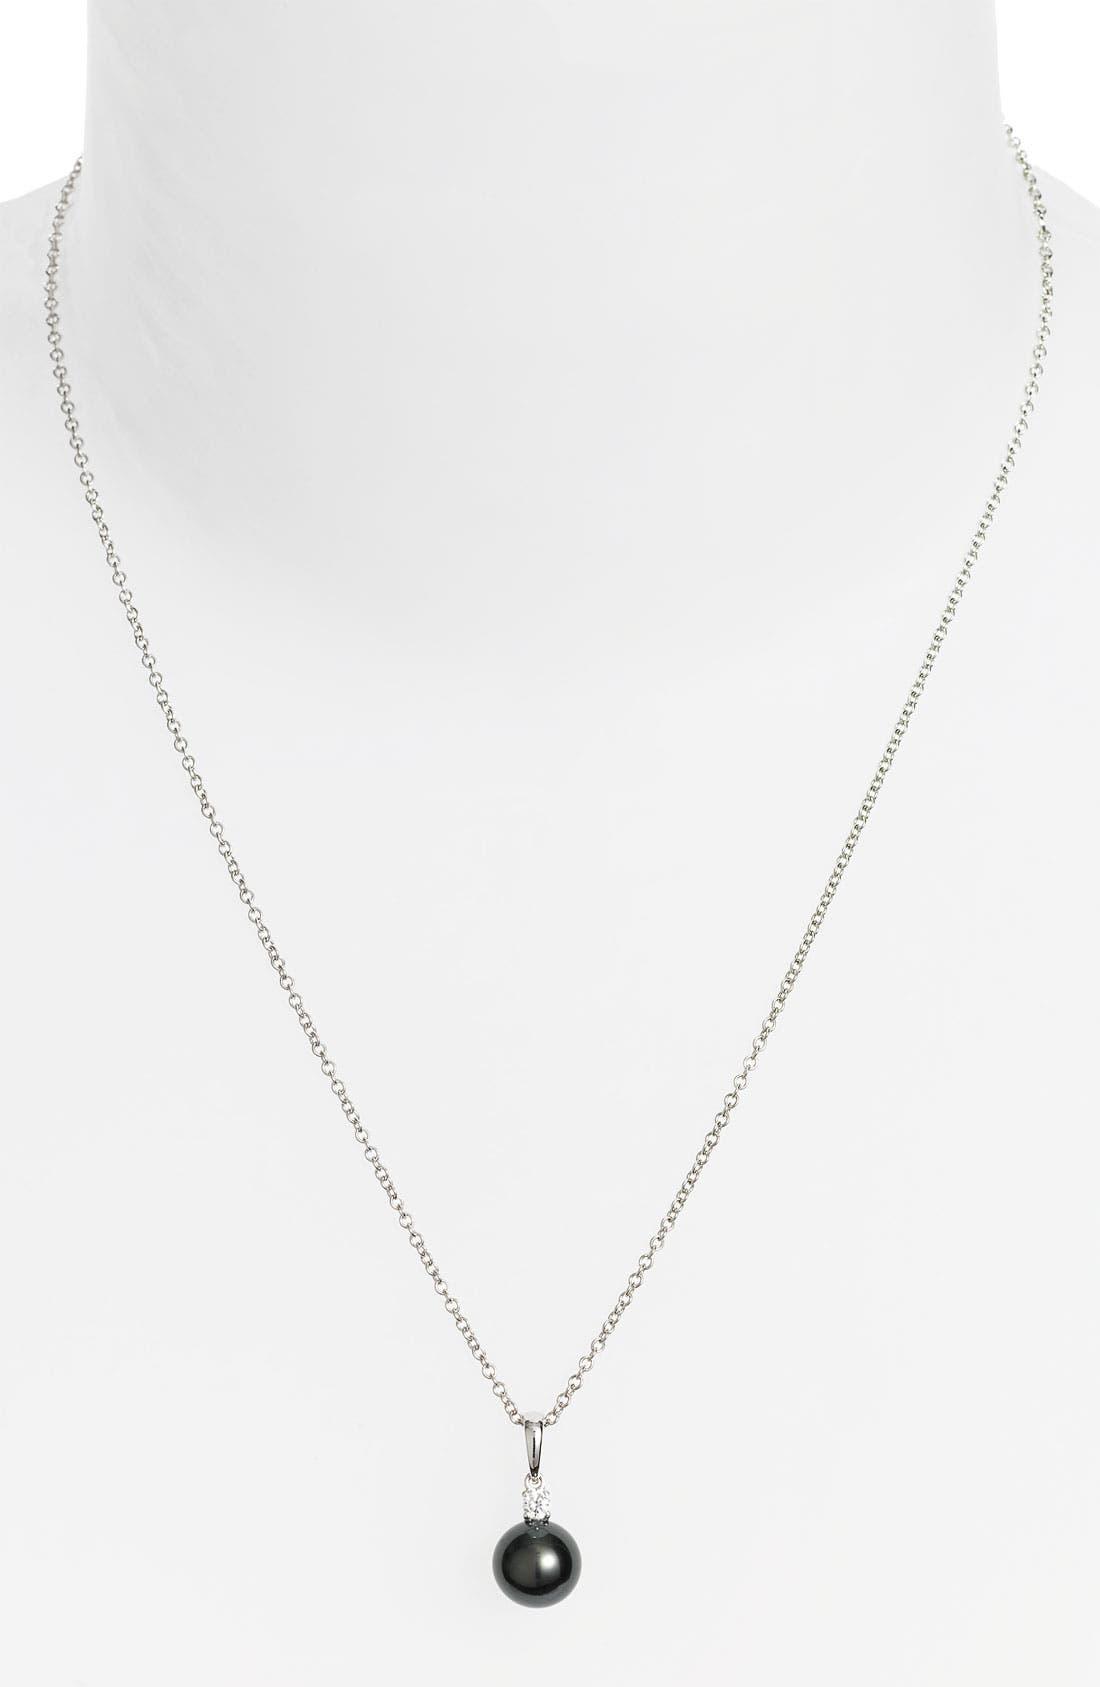 Alternate Image 1 Selected - Mikimoto Diamond & Black South Sea Cultured Pearl Pendant Necklace